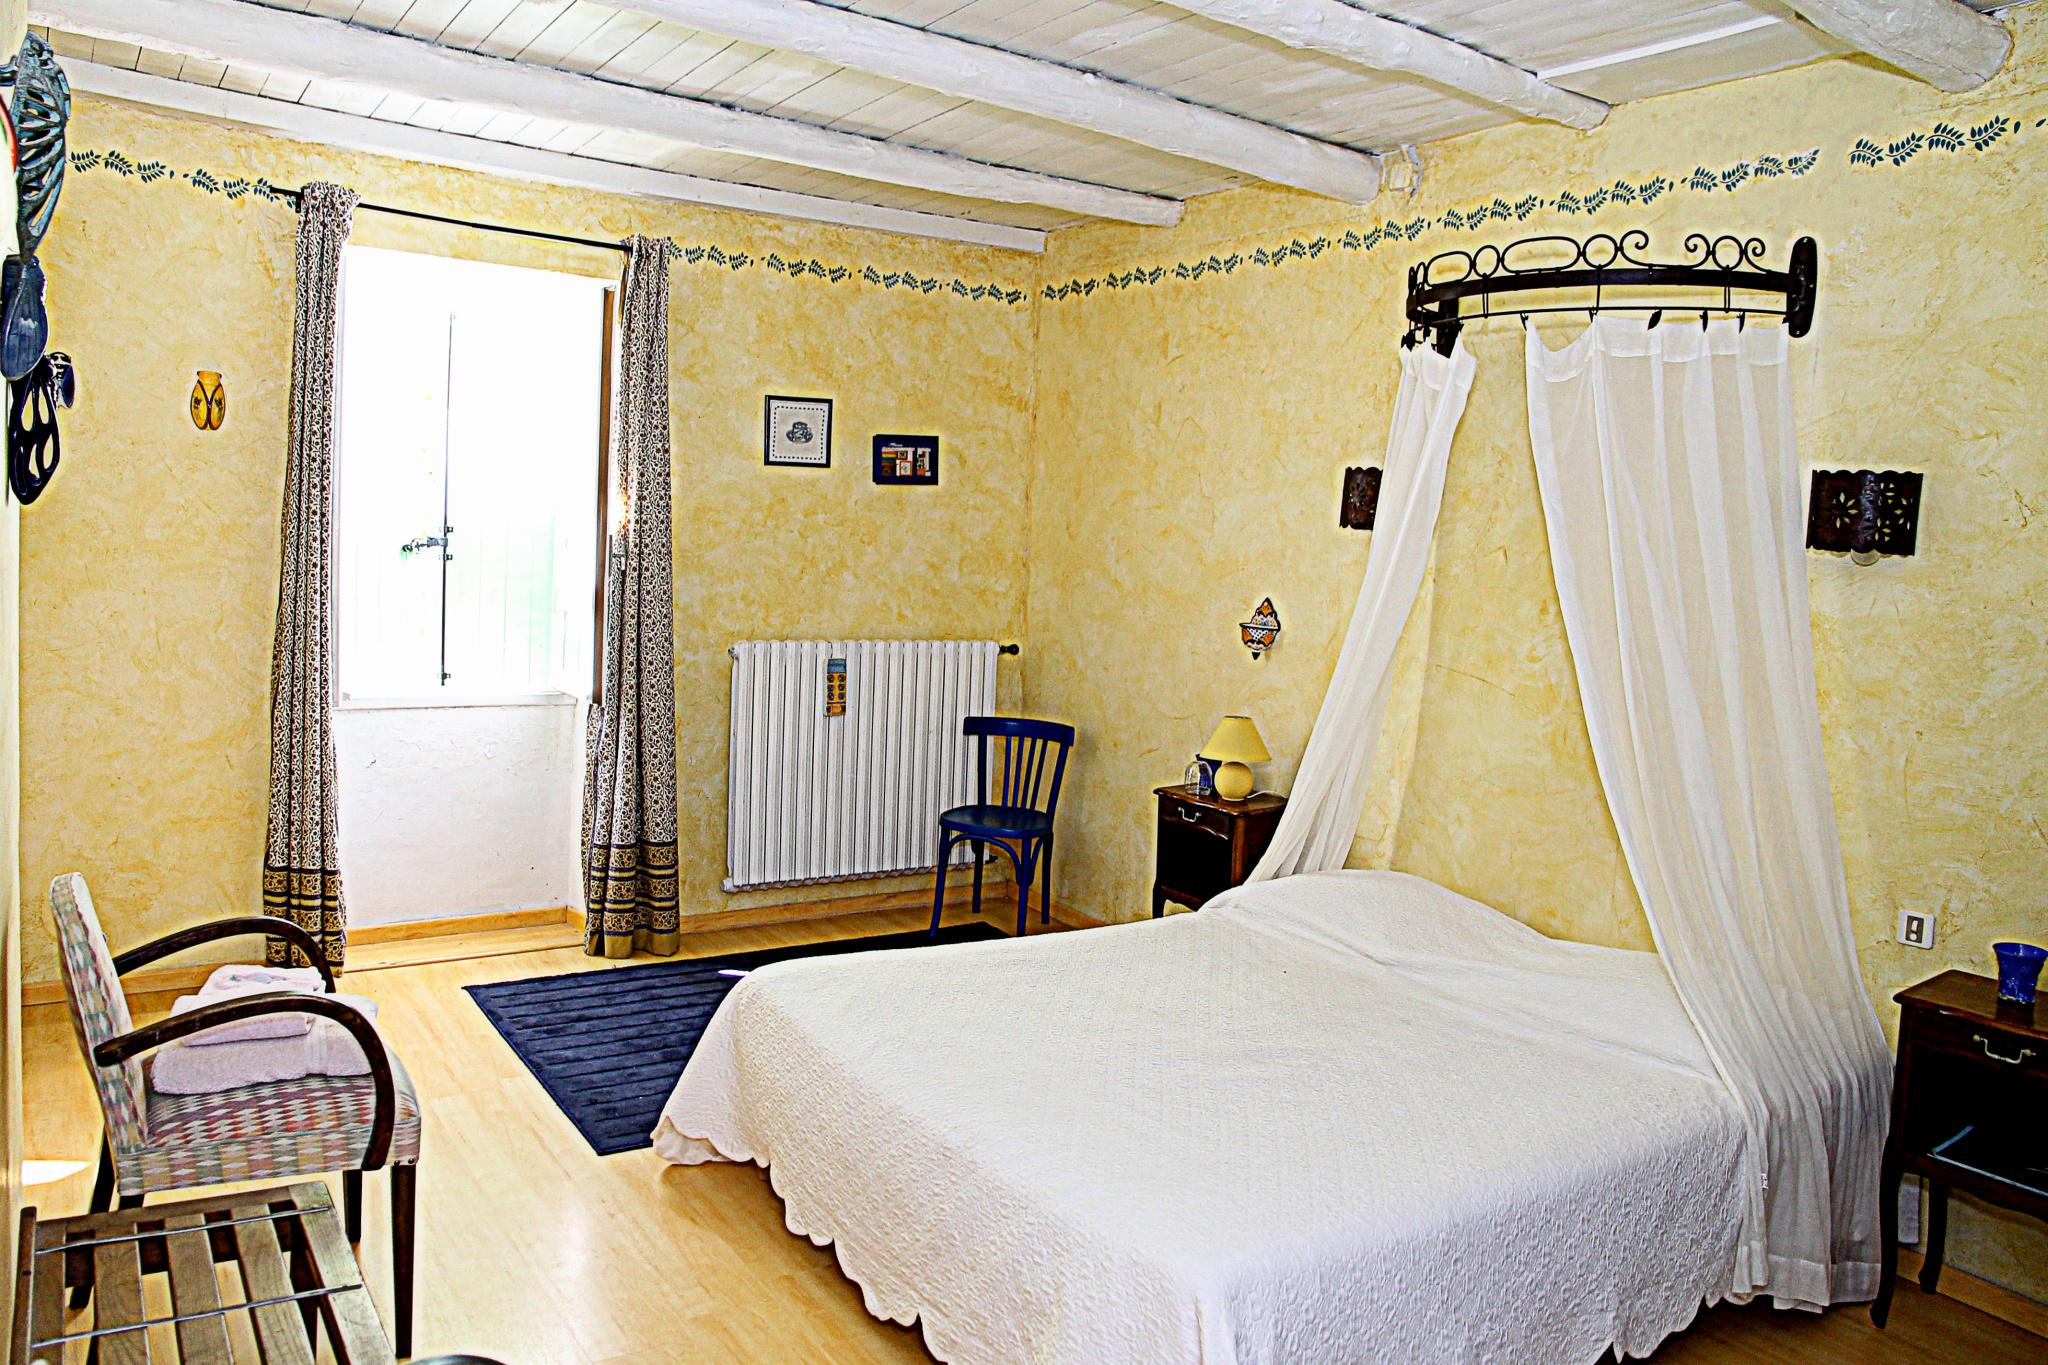 vente maison la garde adhemar rhone alpes 499 000 00 euros immo gratuit. Black Bedroom Furniture Sets. Home Design Ideas